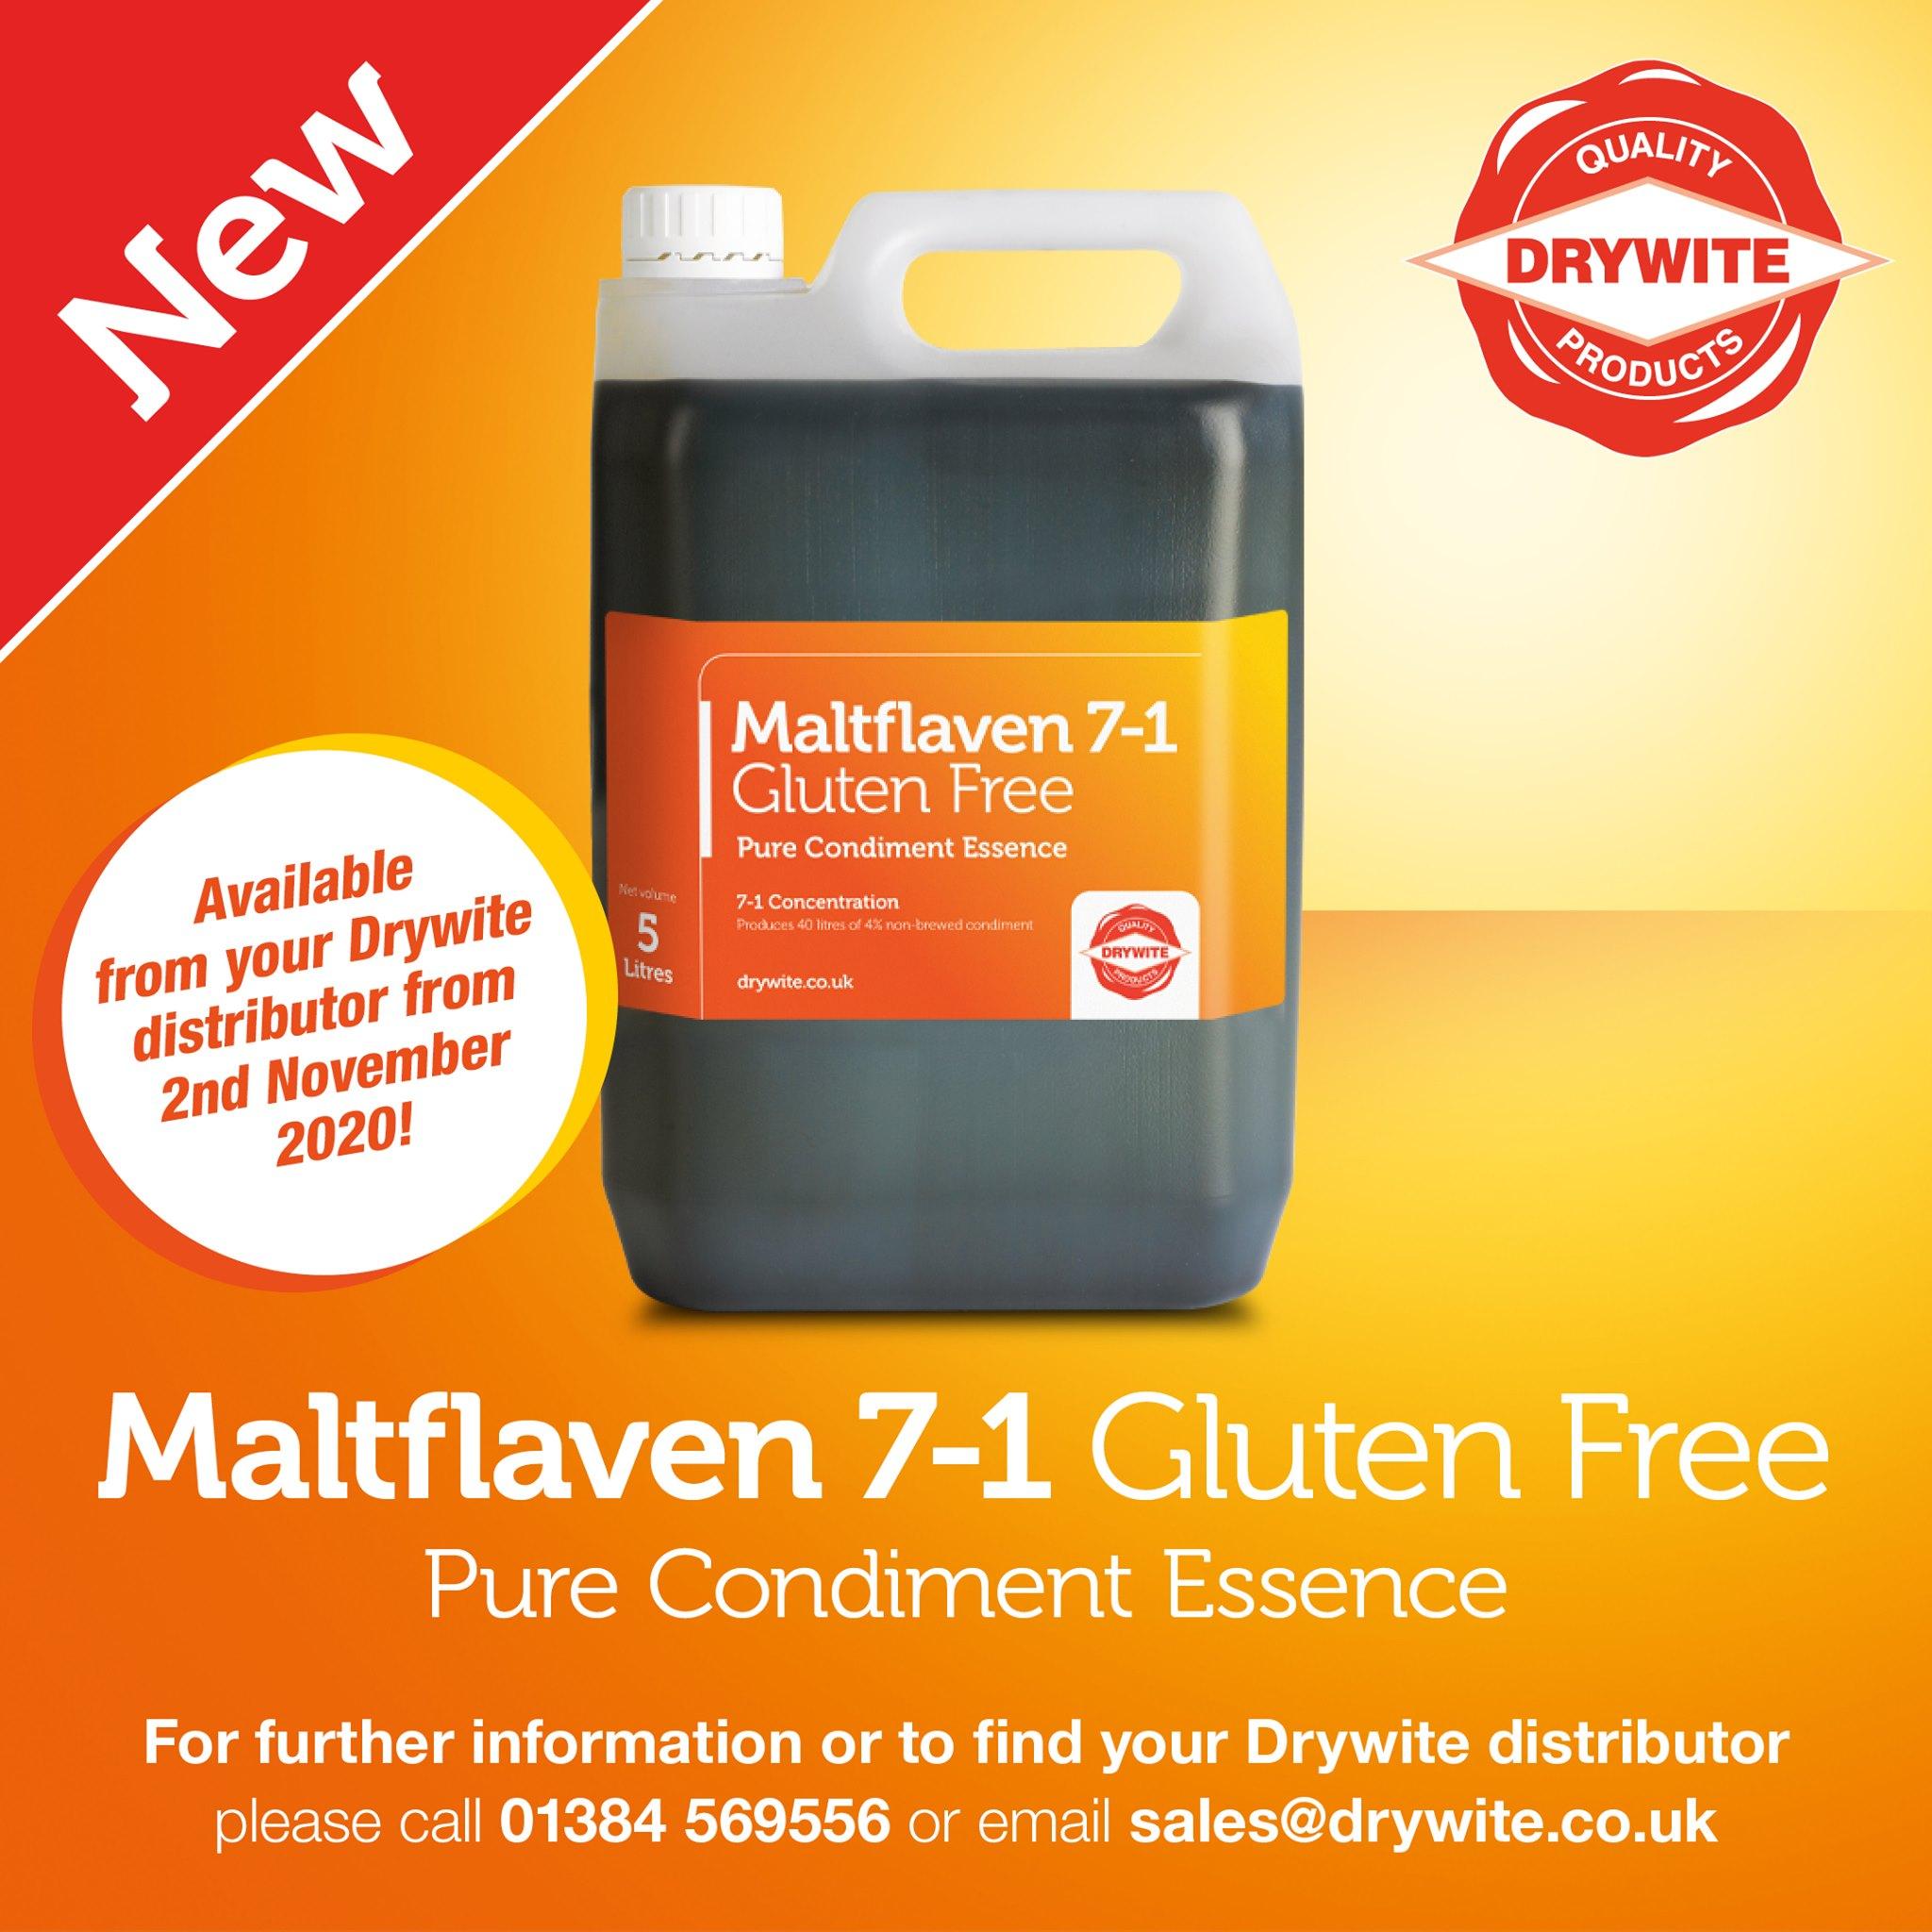 New from Drywite Ltd - Maltfalven 7-1 Gluten Free Pure Condiment Essence!